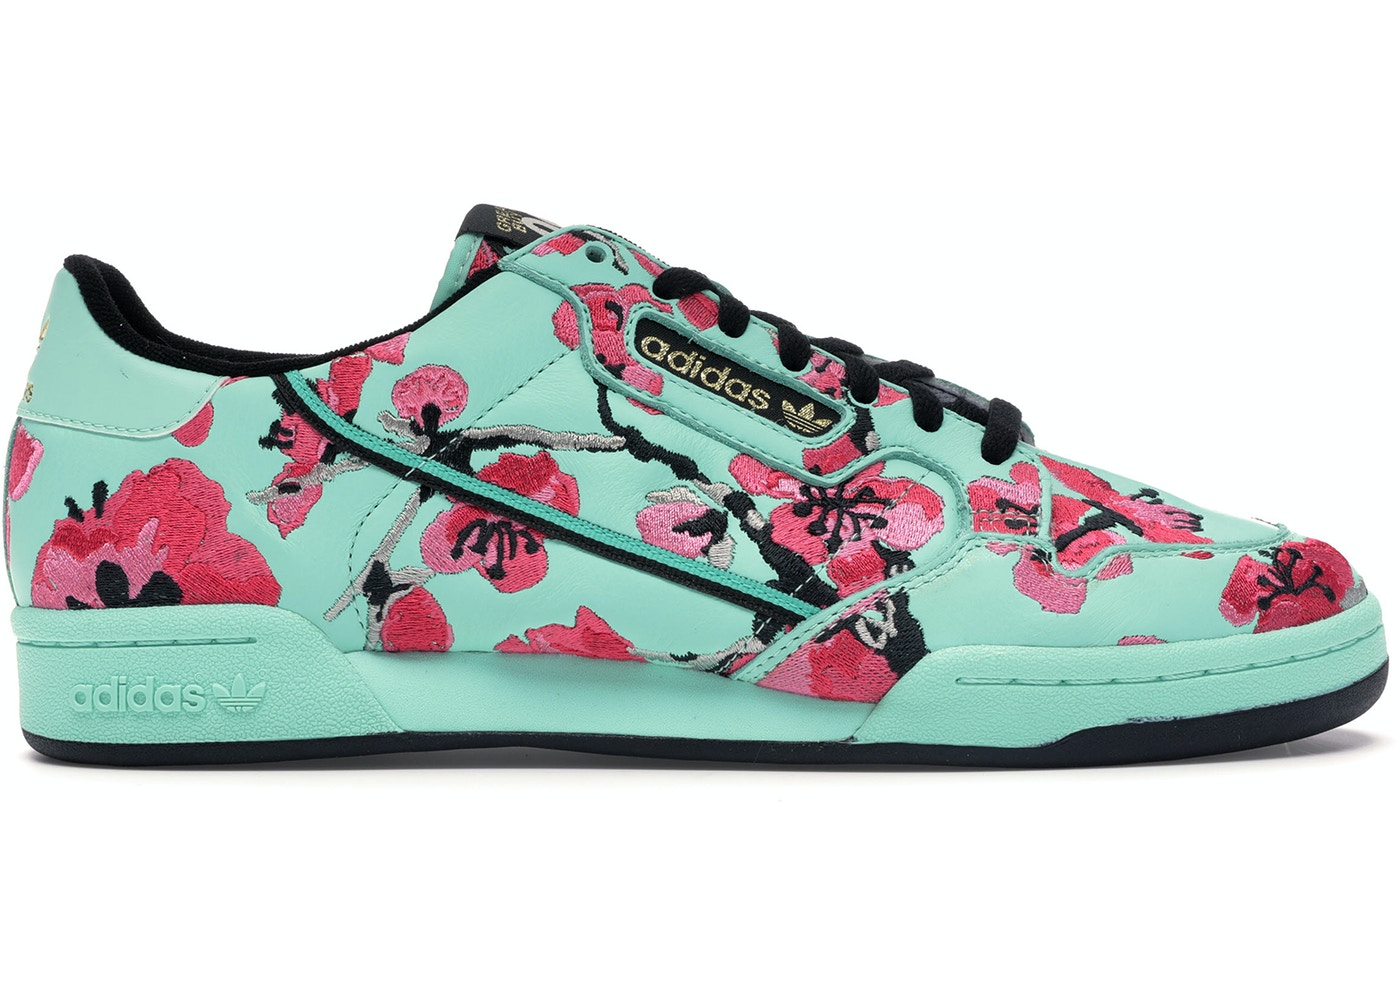 28c834c1 adidas Continental 80 AriZona Green Tea Ginseng - Sneakers